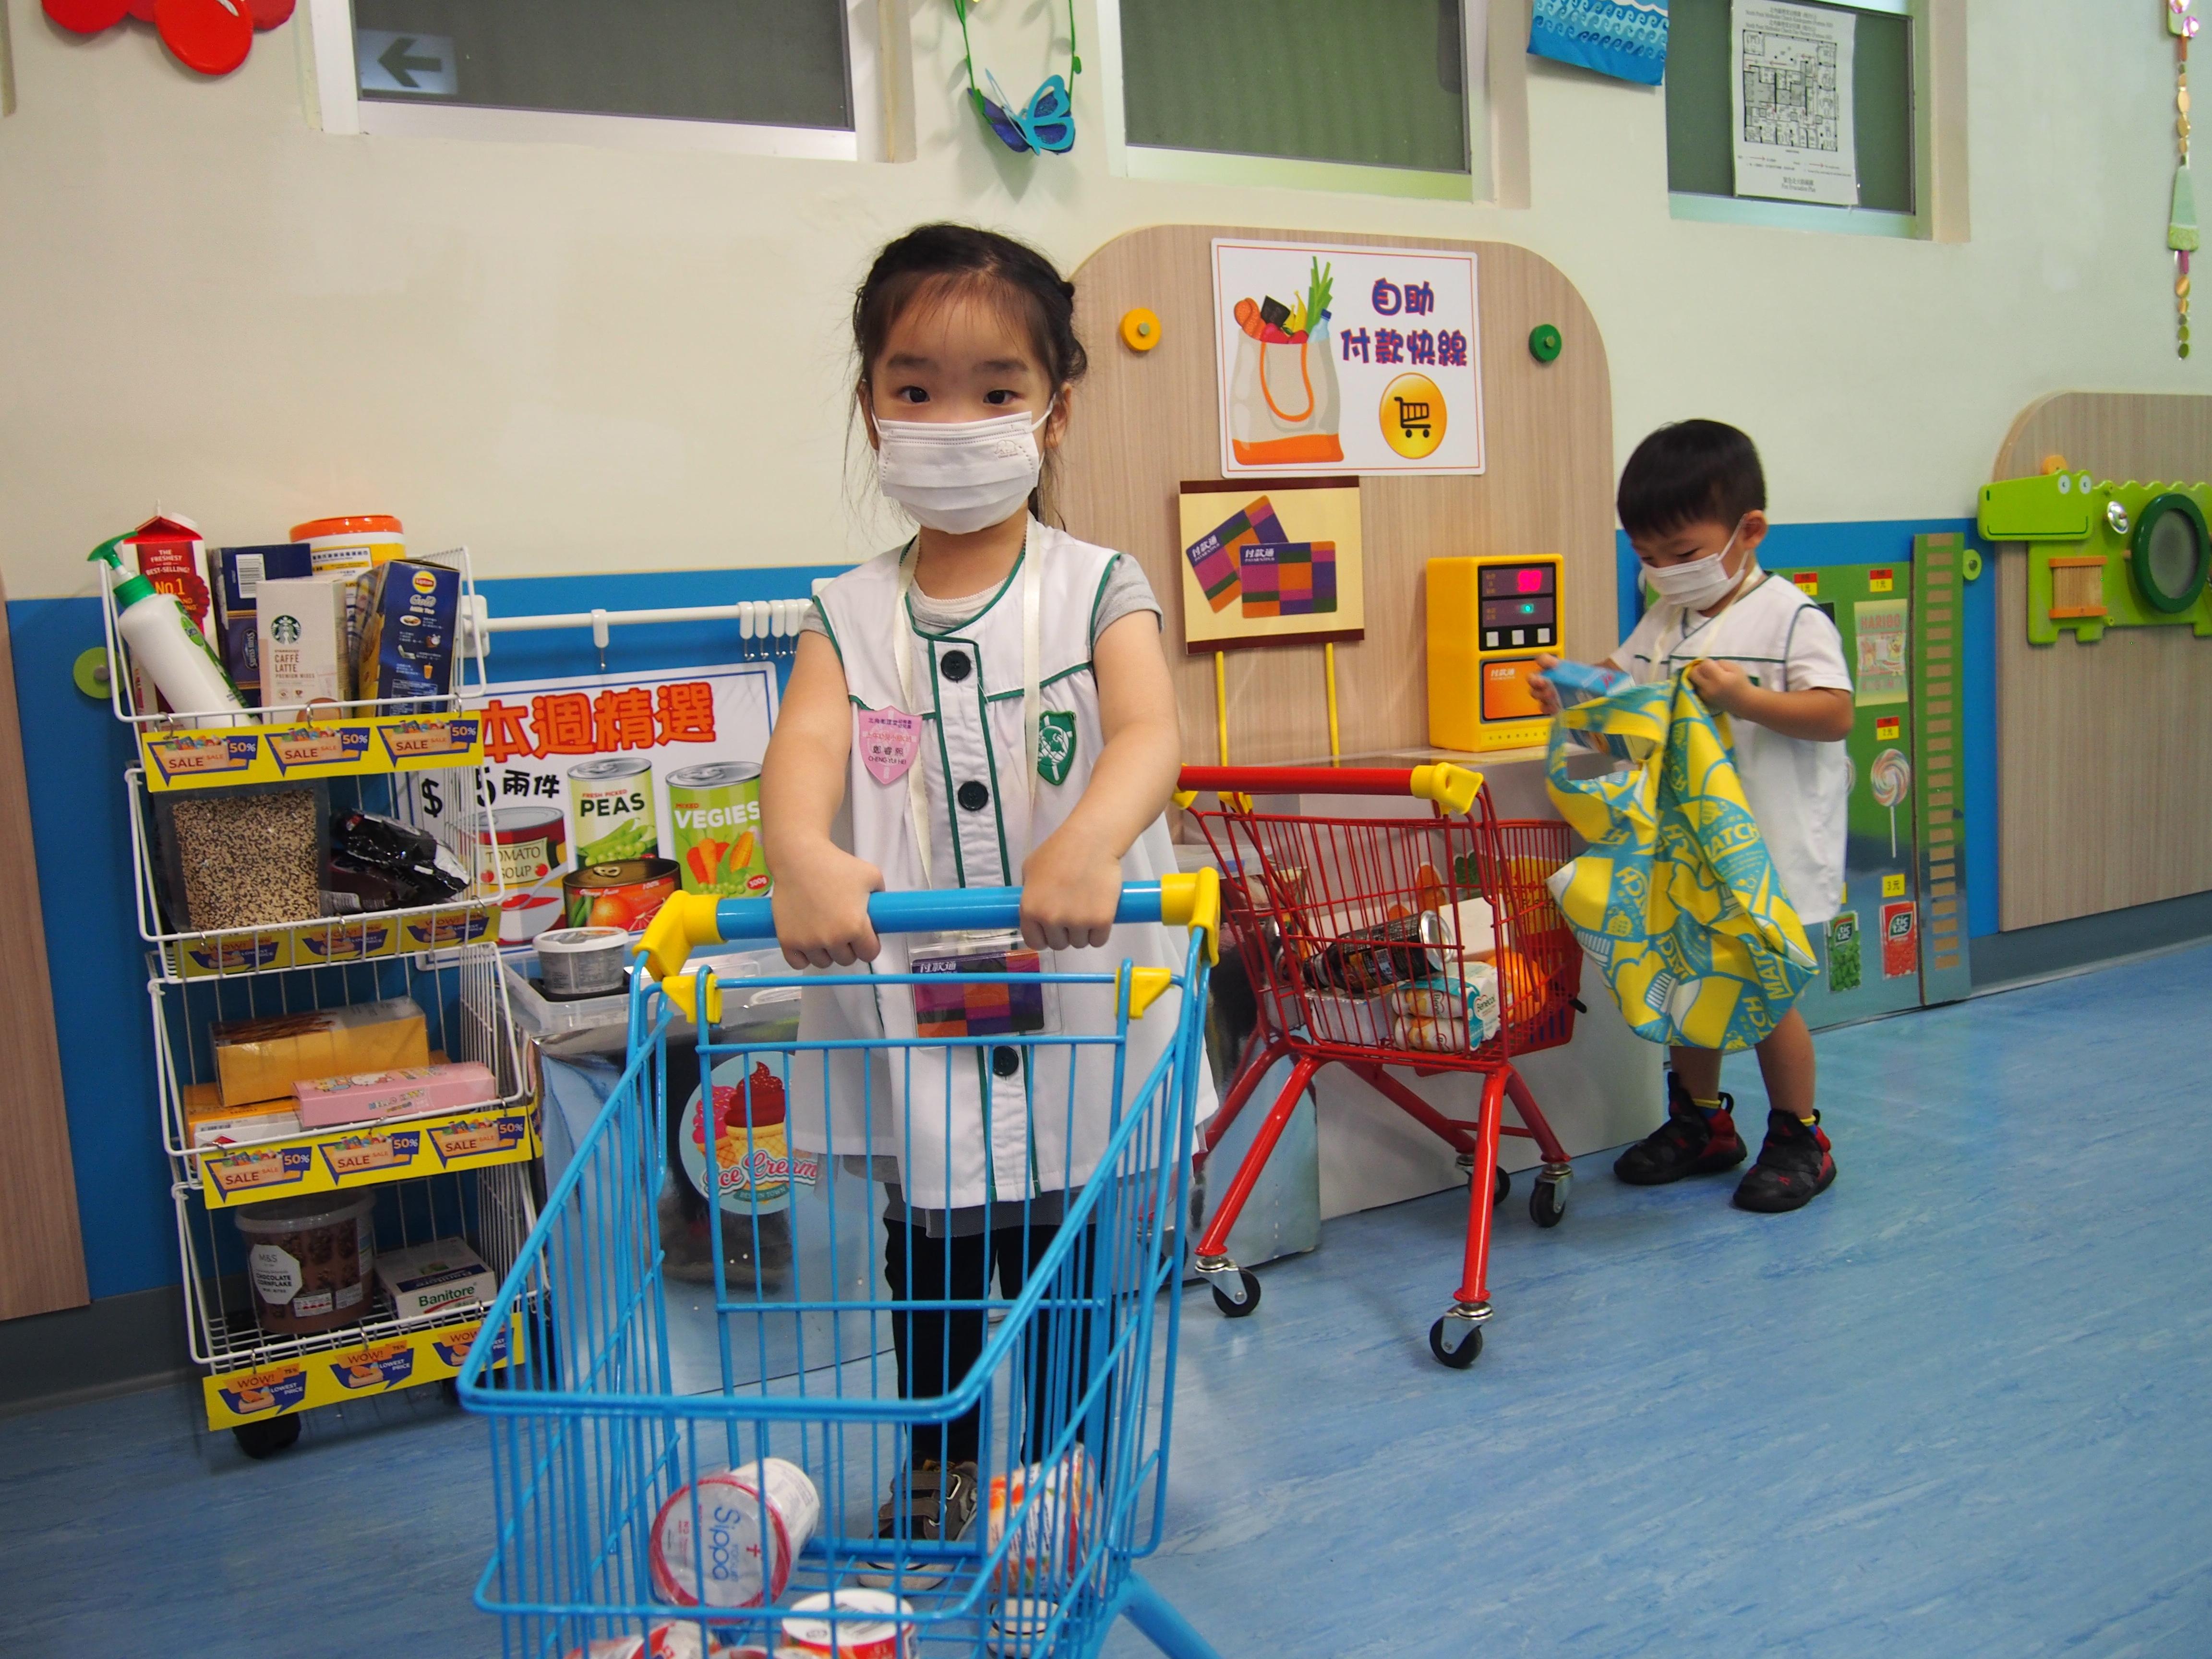 http://npmc.edu.hk/sites/default/files/p6300013_0.jpg